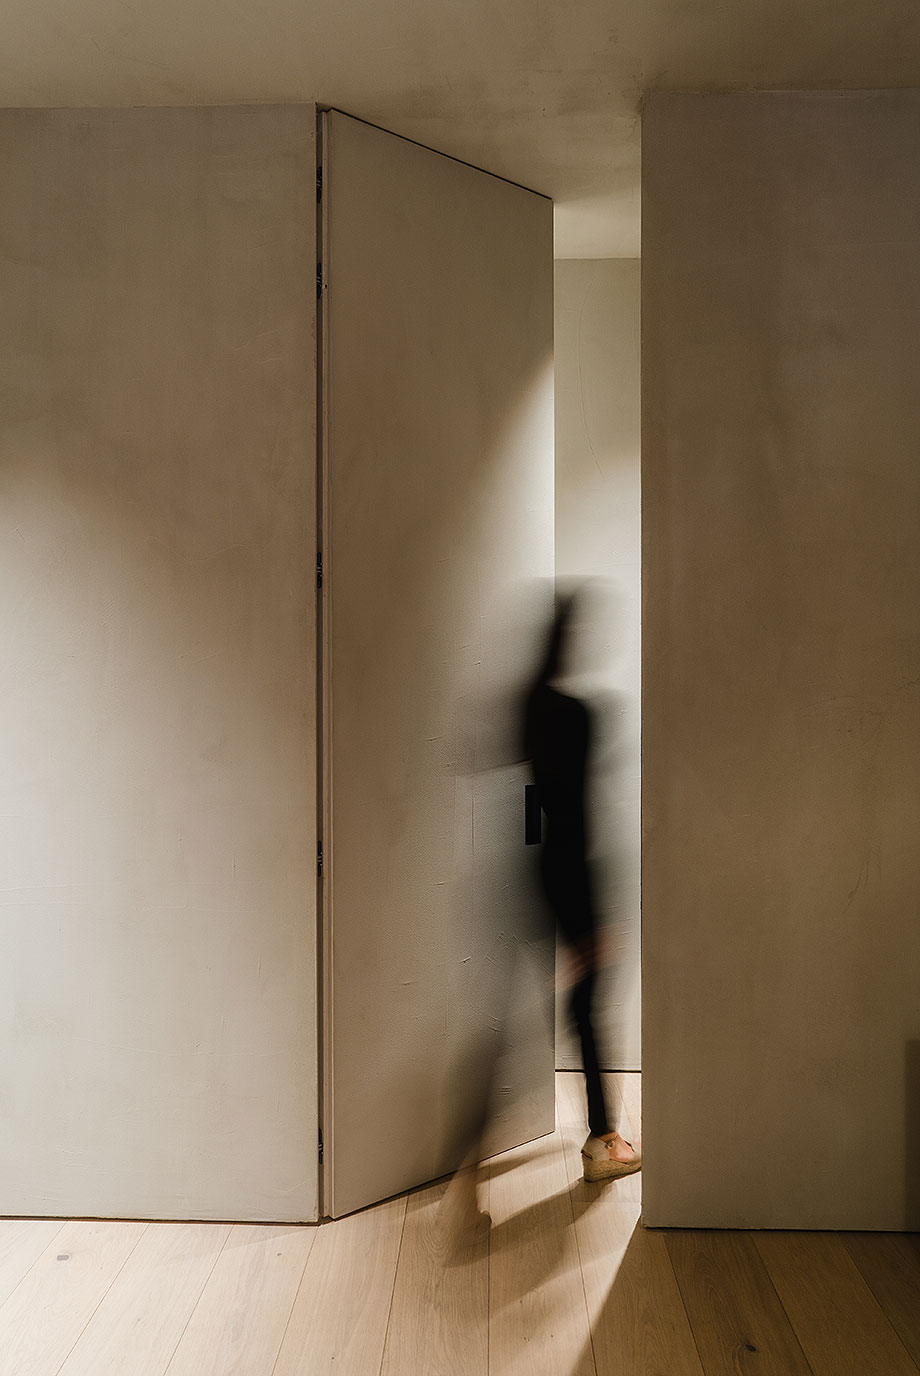 bulthaup sant cugat por francesc rife studio (17) - foto montse capdevila